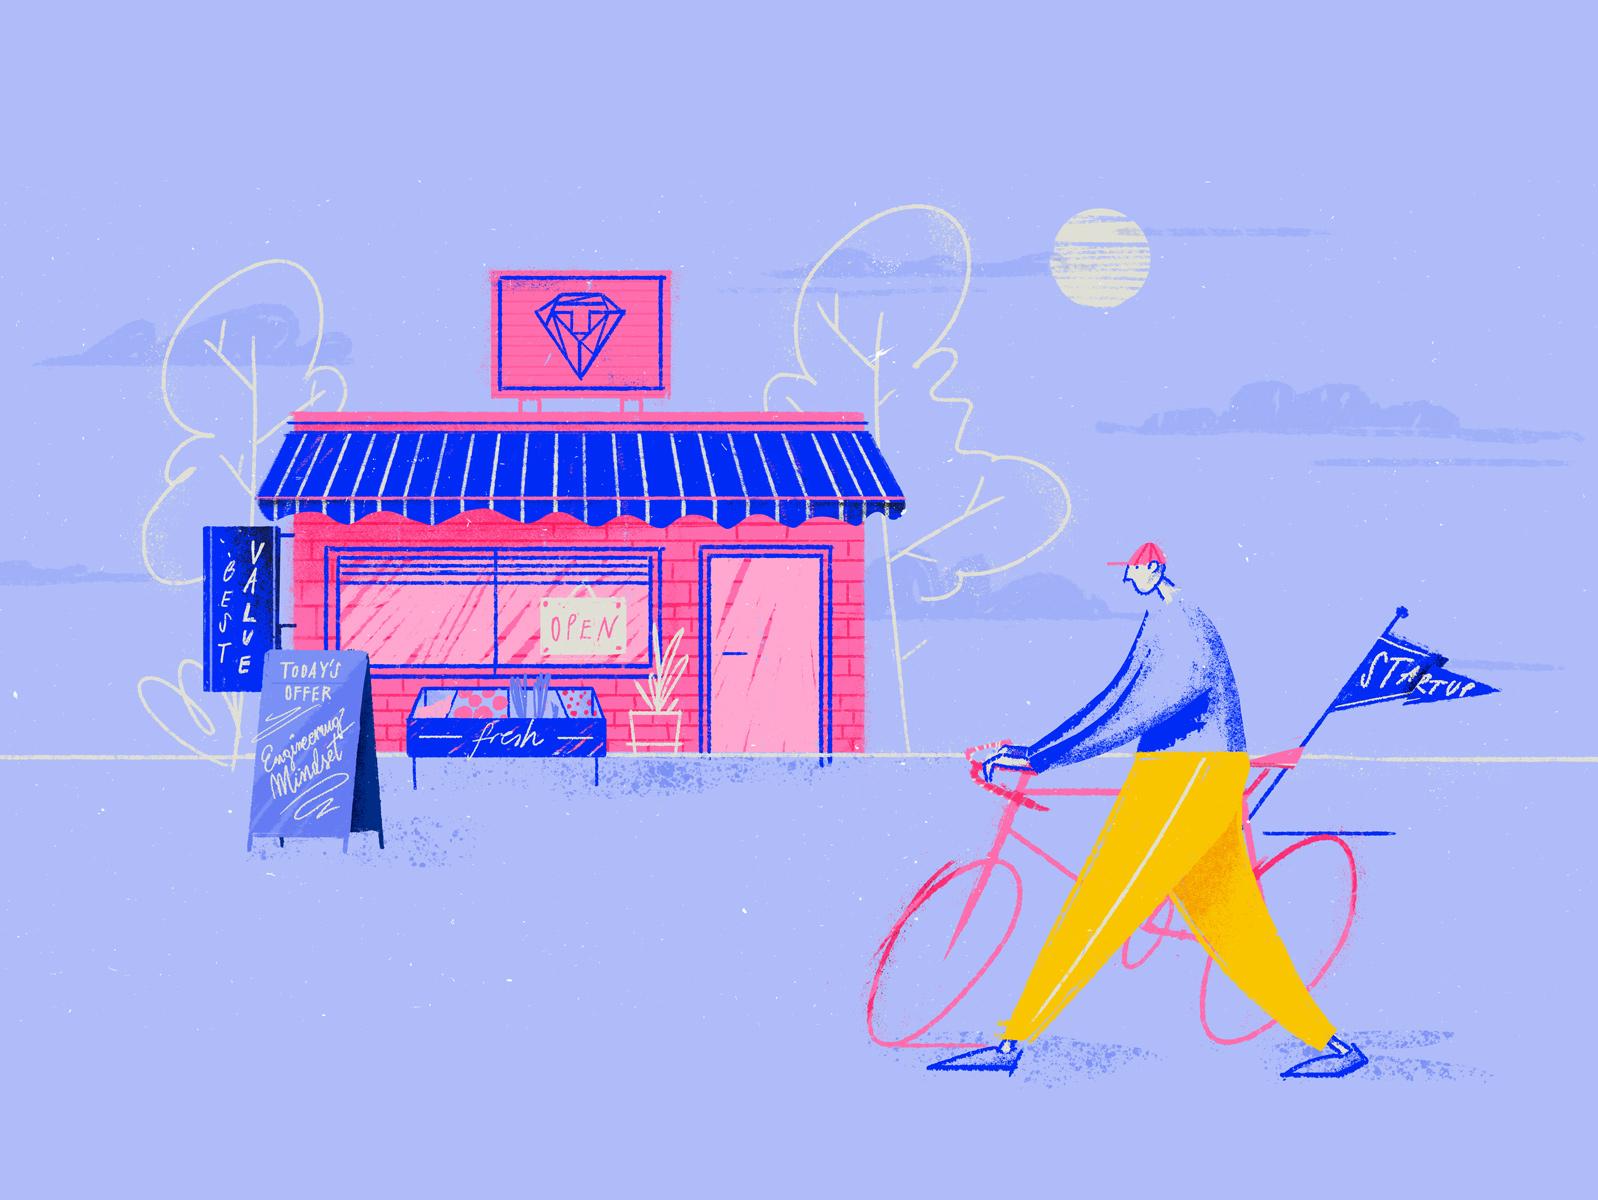 How to choose a Dev Shop brush photoshop bike shop design wrocław blog character work tooploox illustration